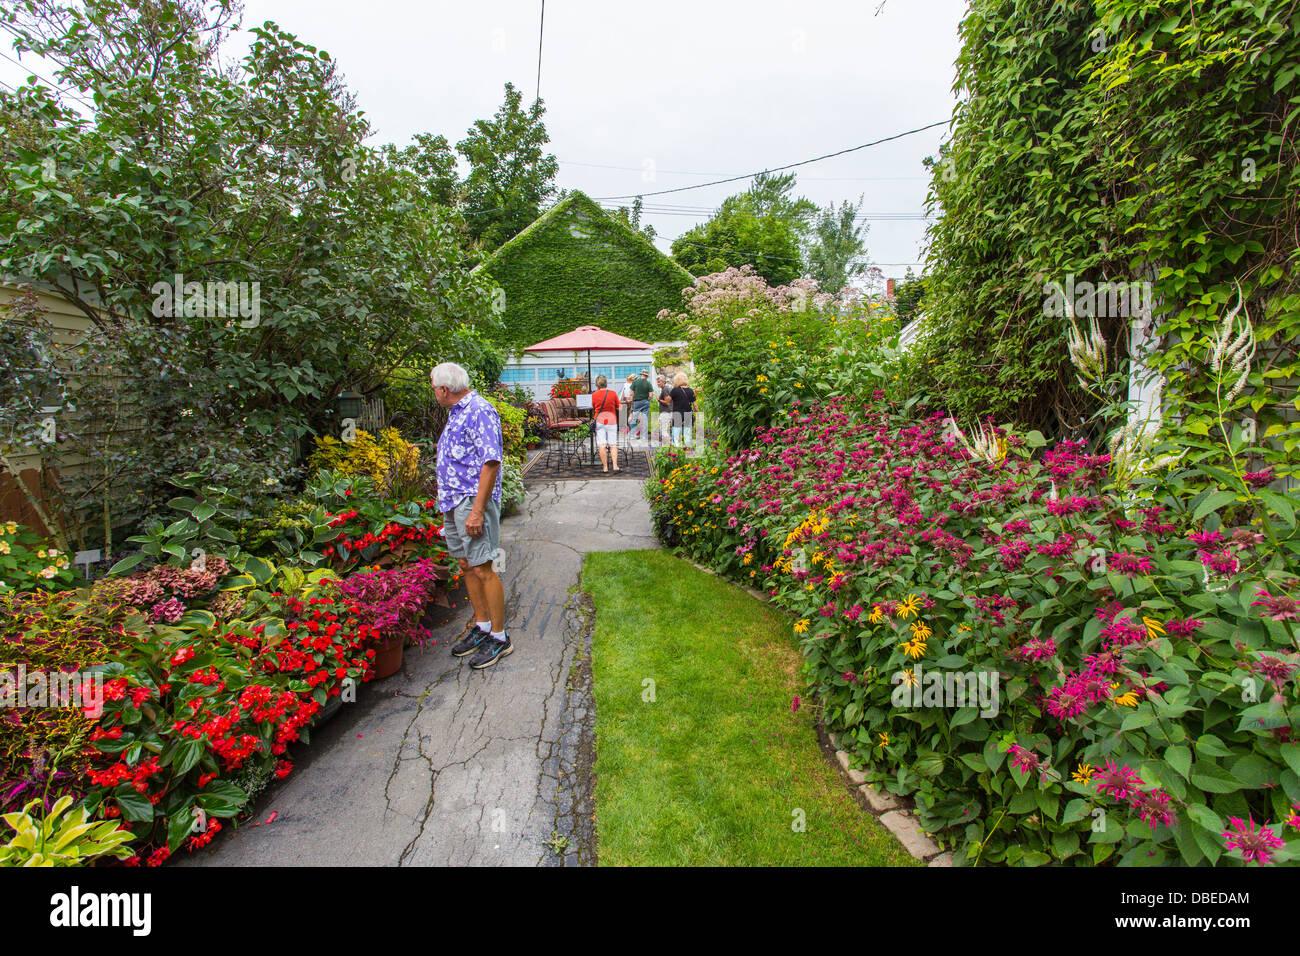 Garden Walk Buffalo Cottage District 5: People In Cottage District Part Of GardenWalk Buffalo NY